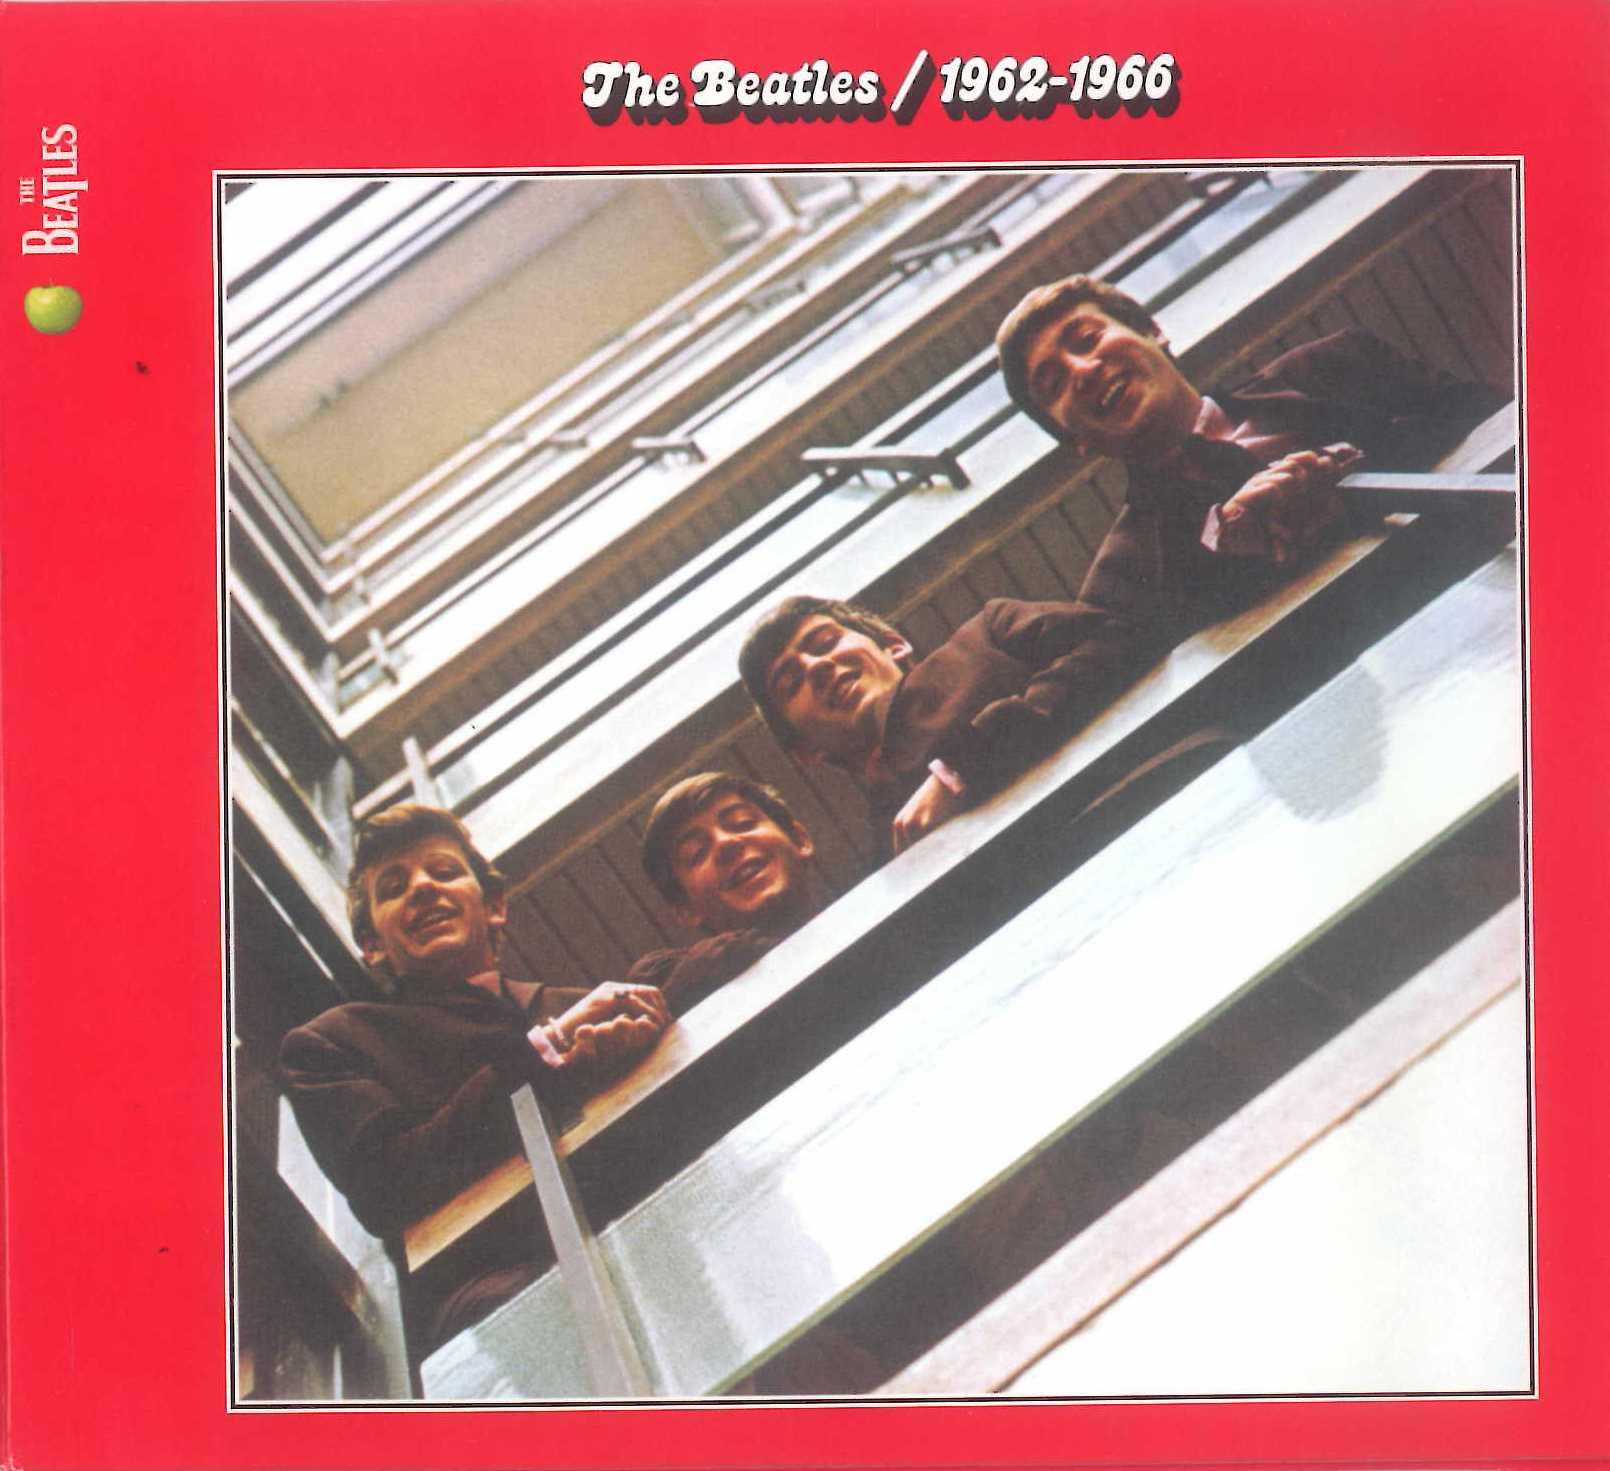 The Beatles: 1962-1966